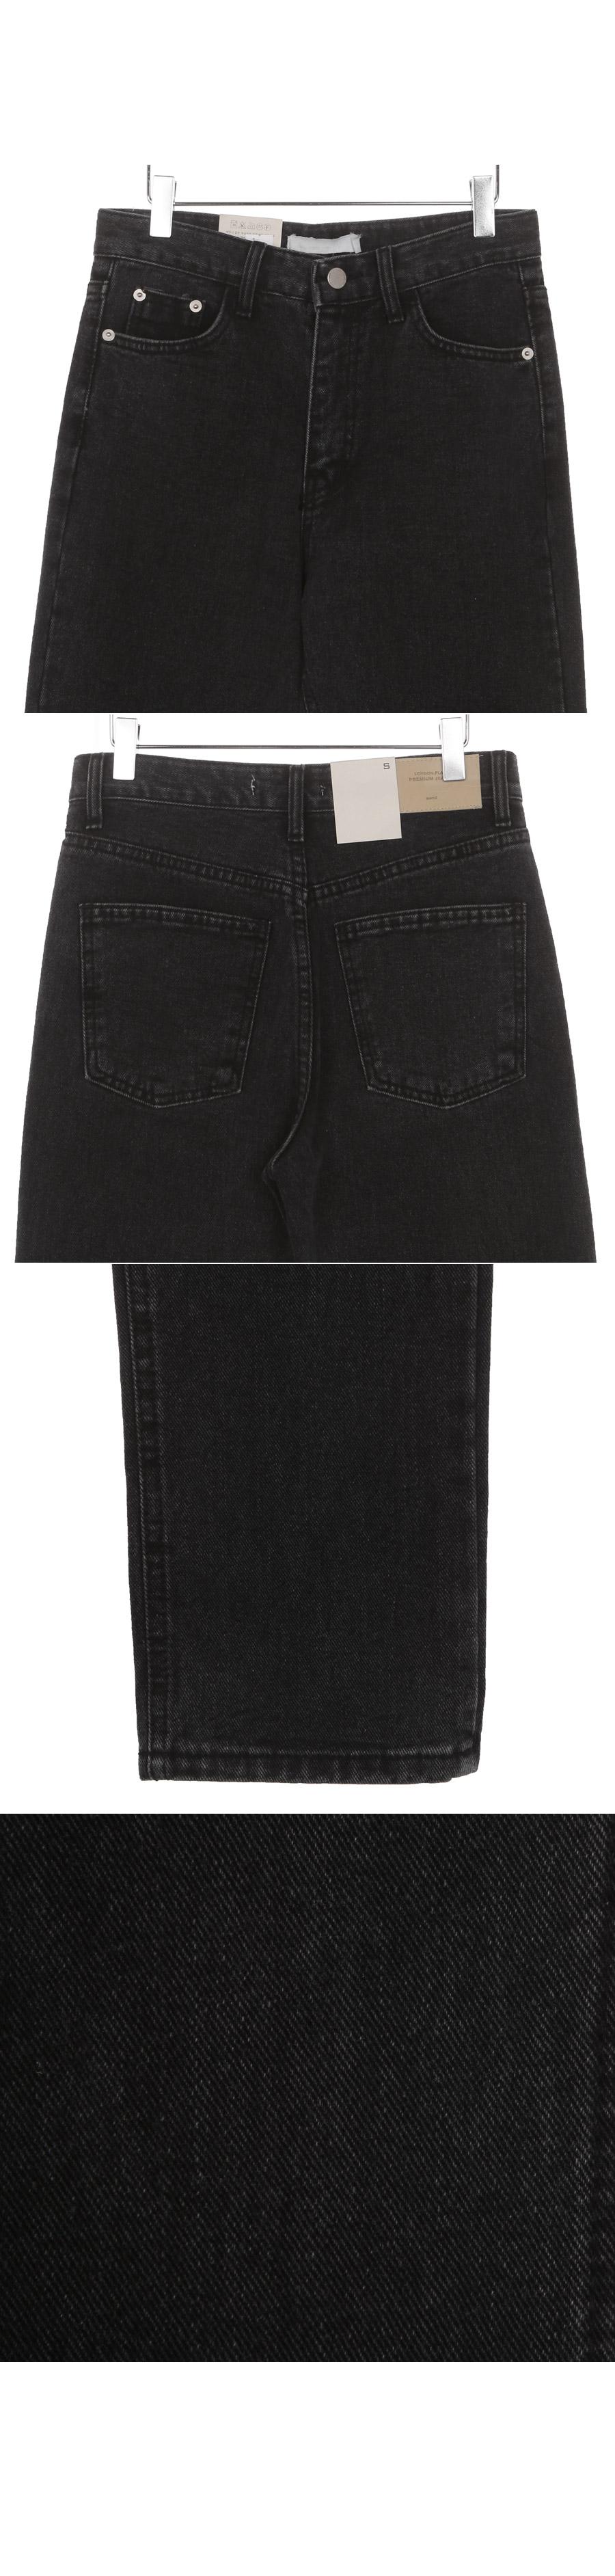 River black blue pants